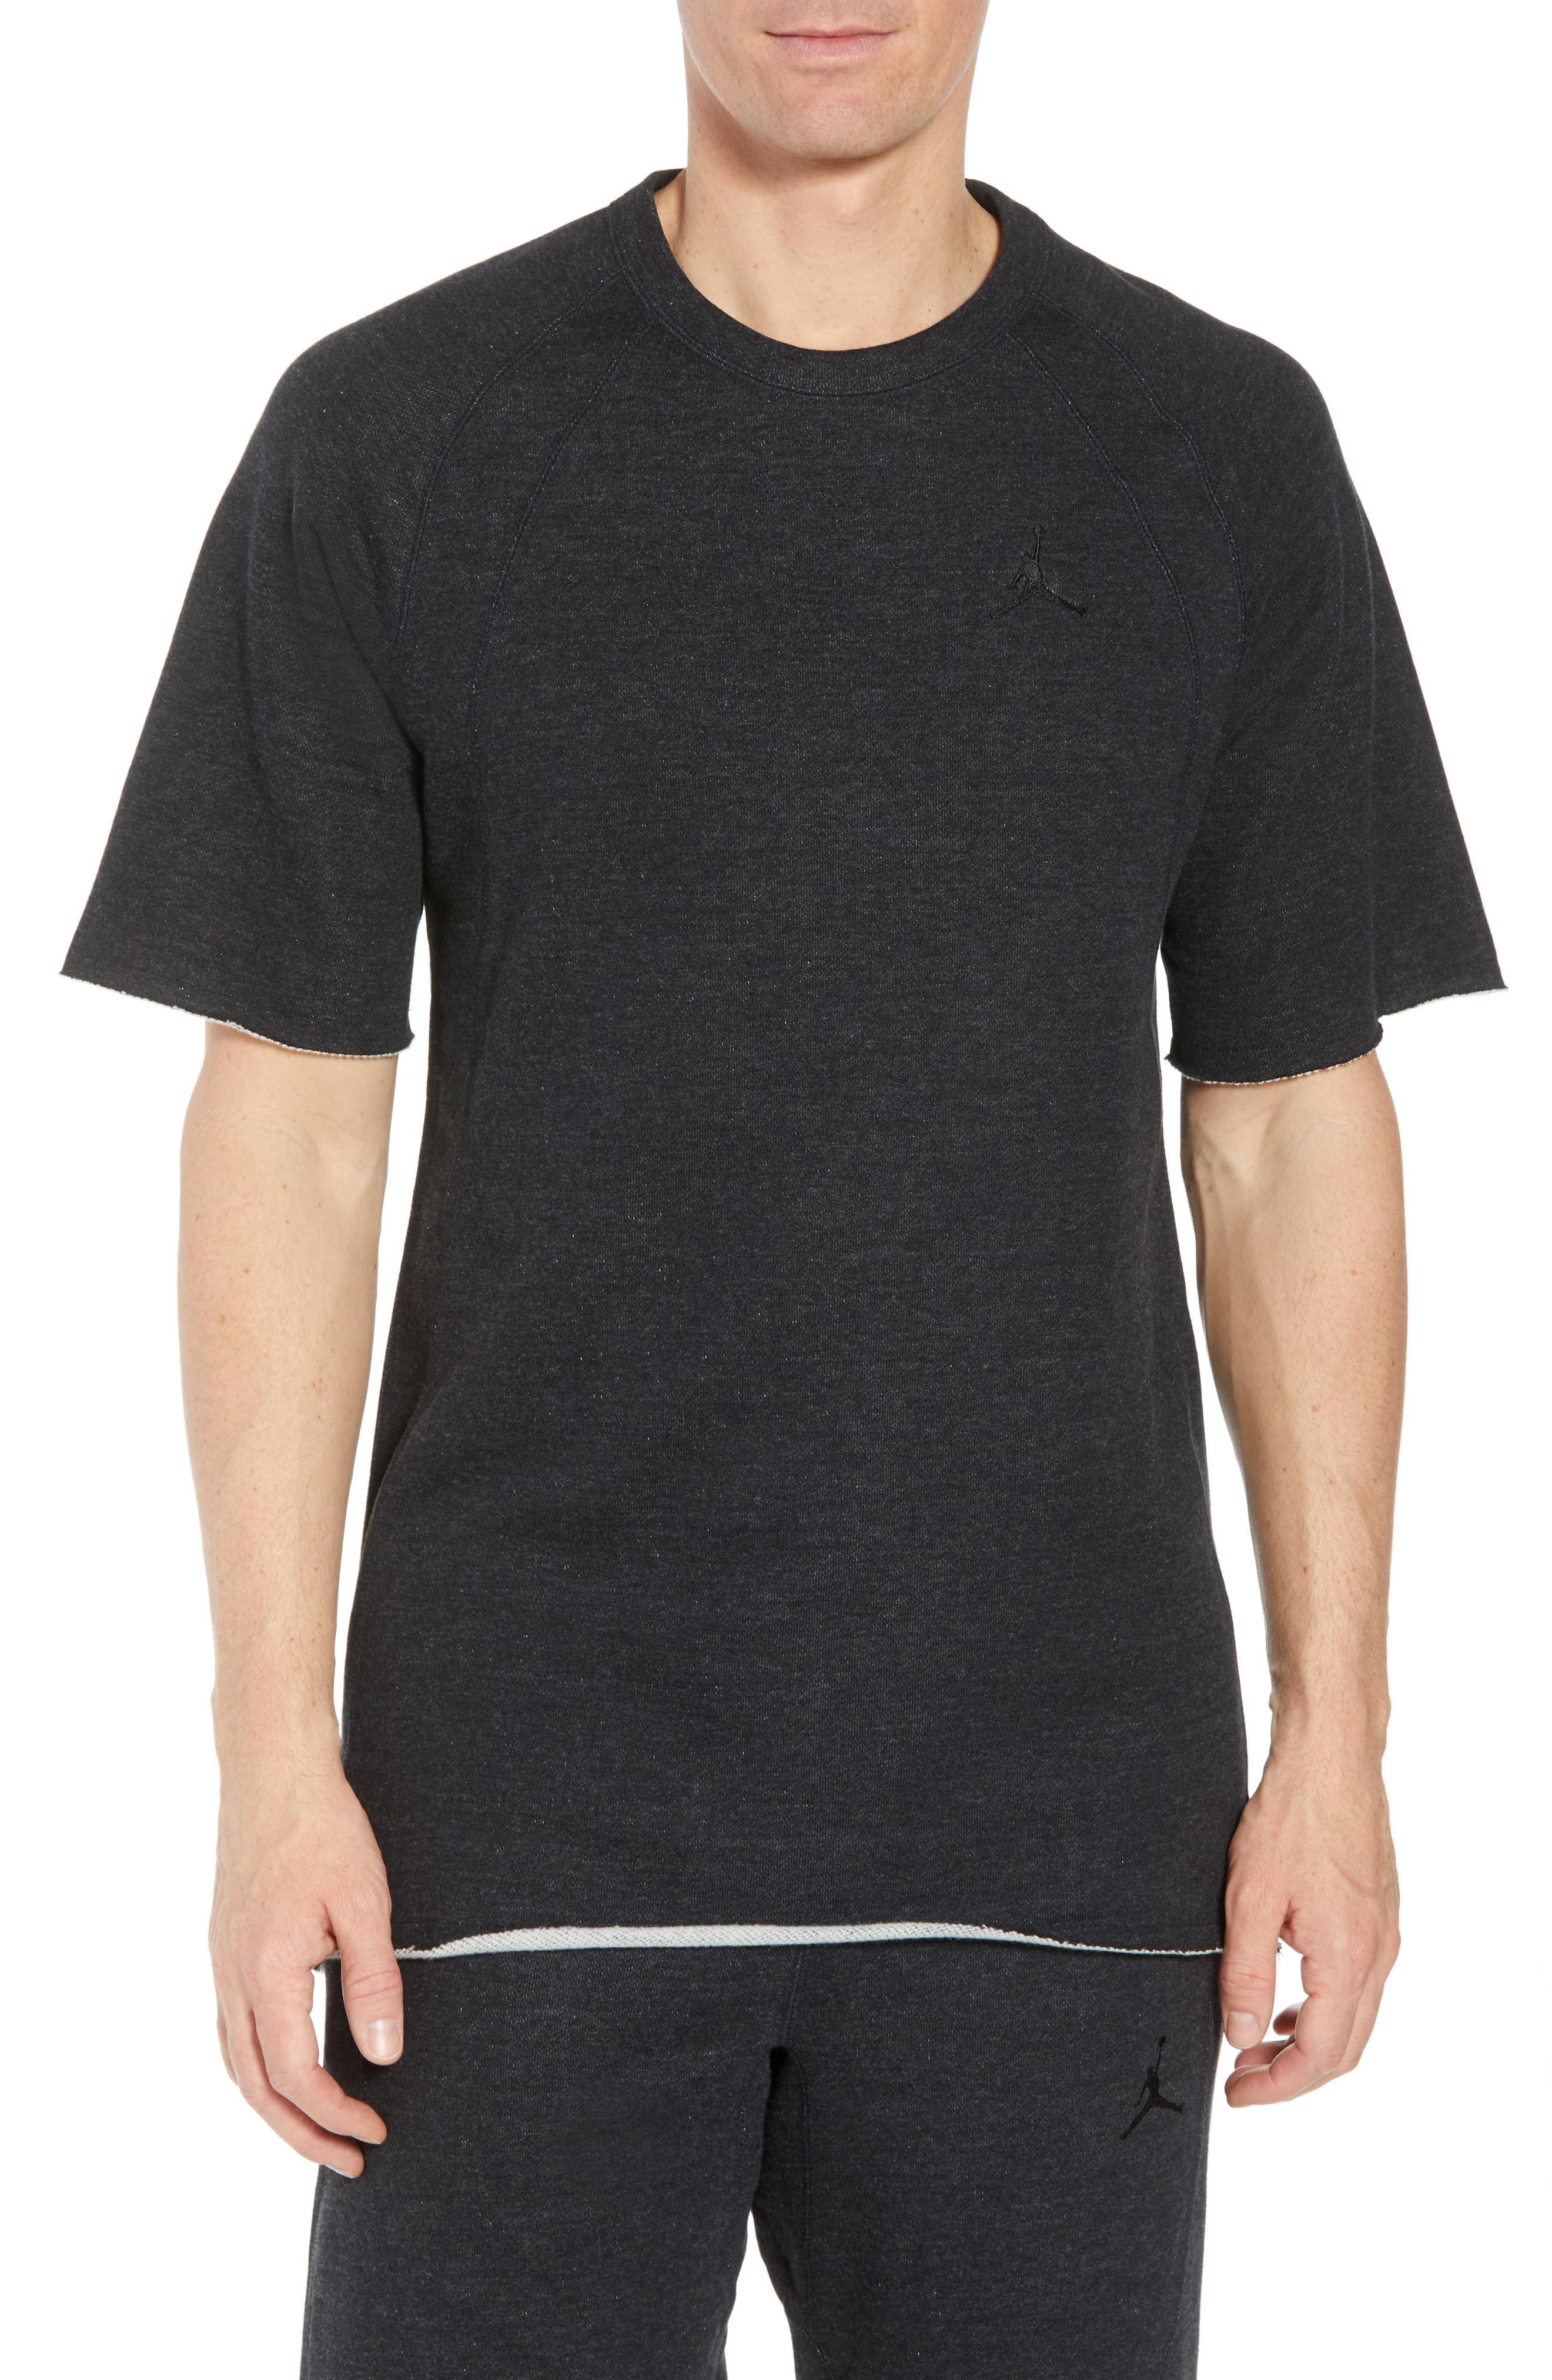 d890c00fb58 Lyst - Nike Wings Light Short Sleeve Sweatshirt in Black for Men